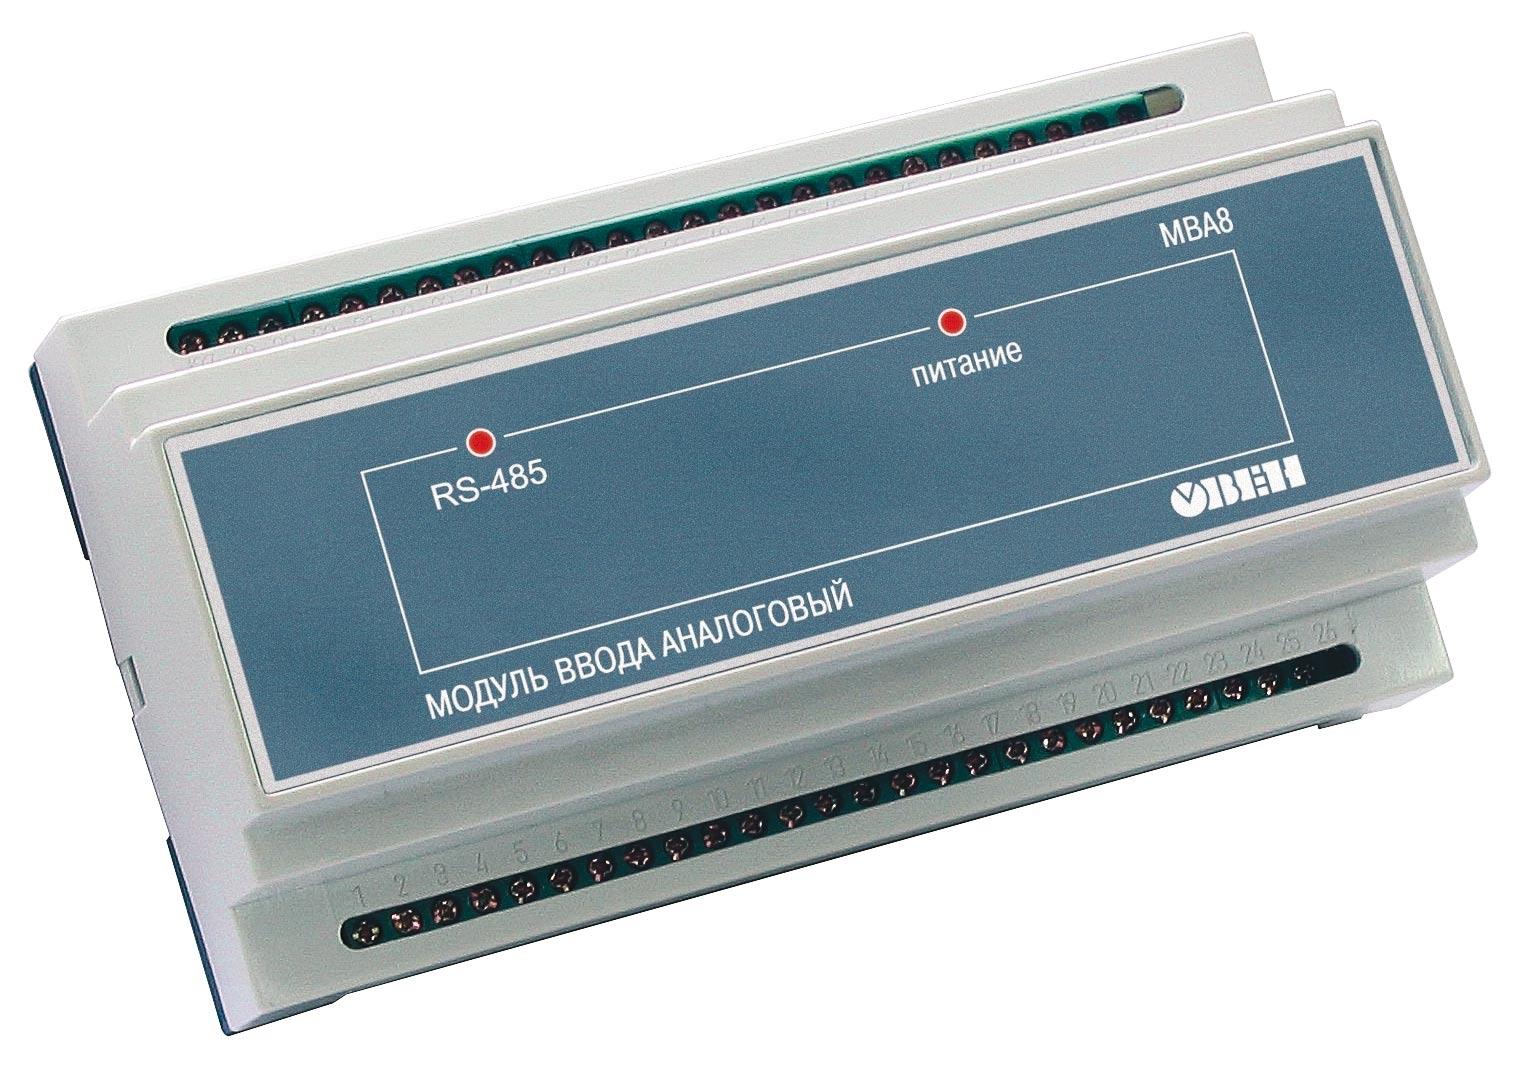 Модуль ввода аналоговый ОВЕН МВА8